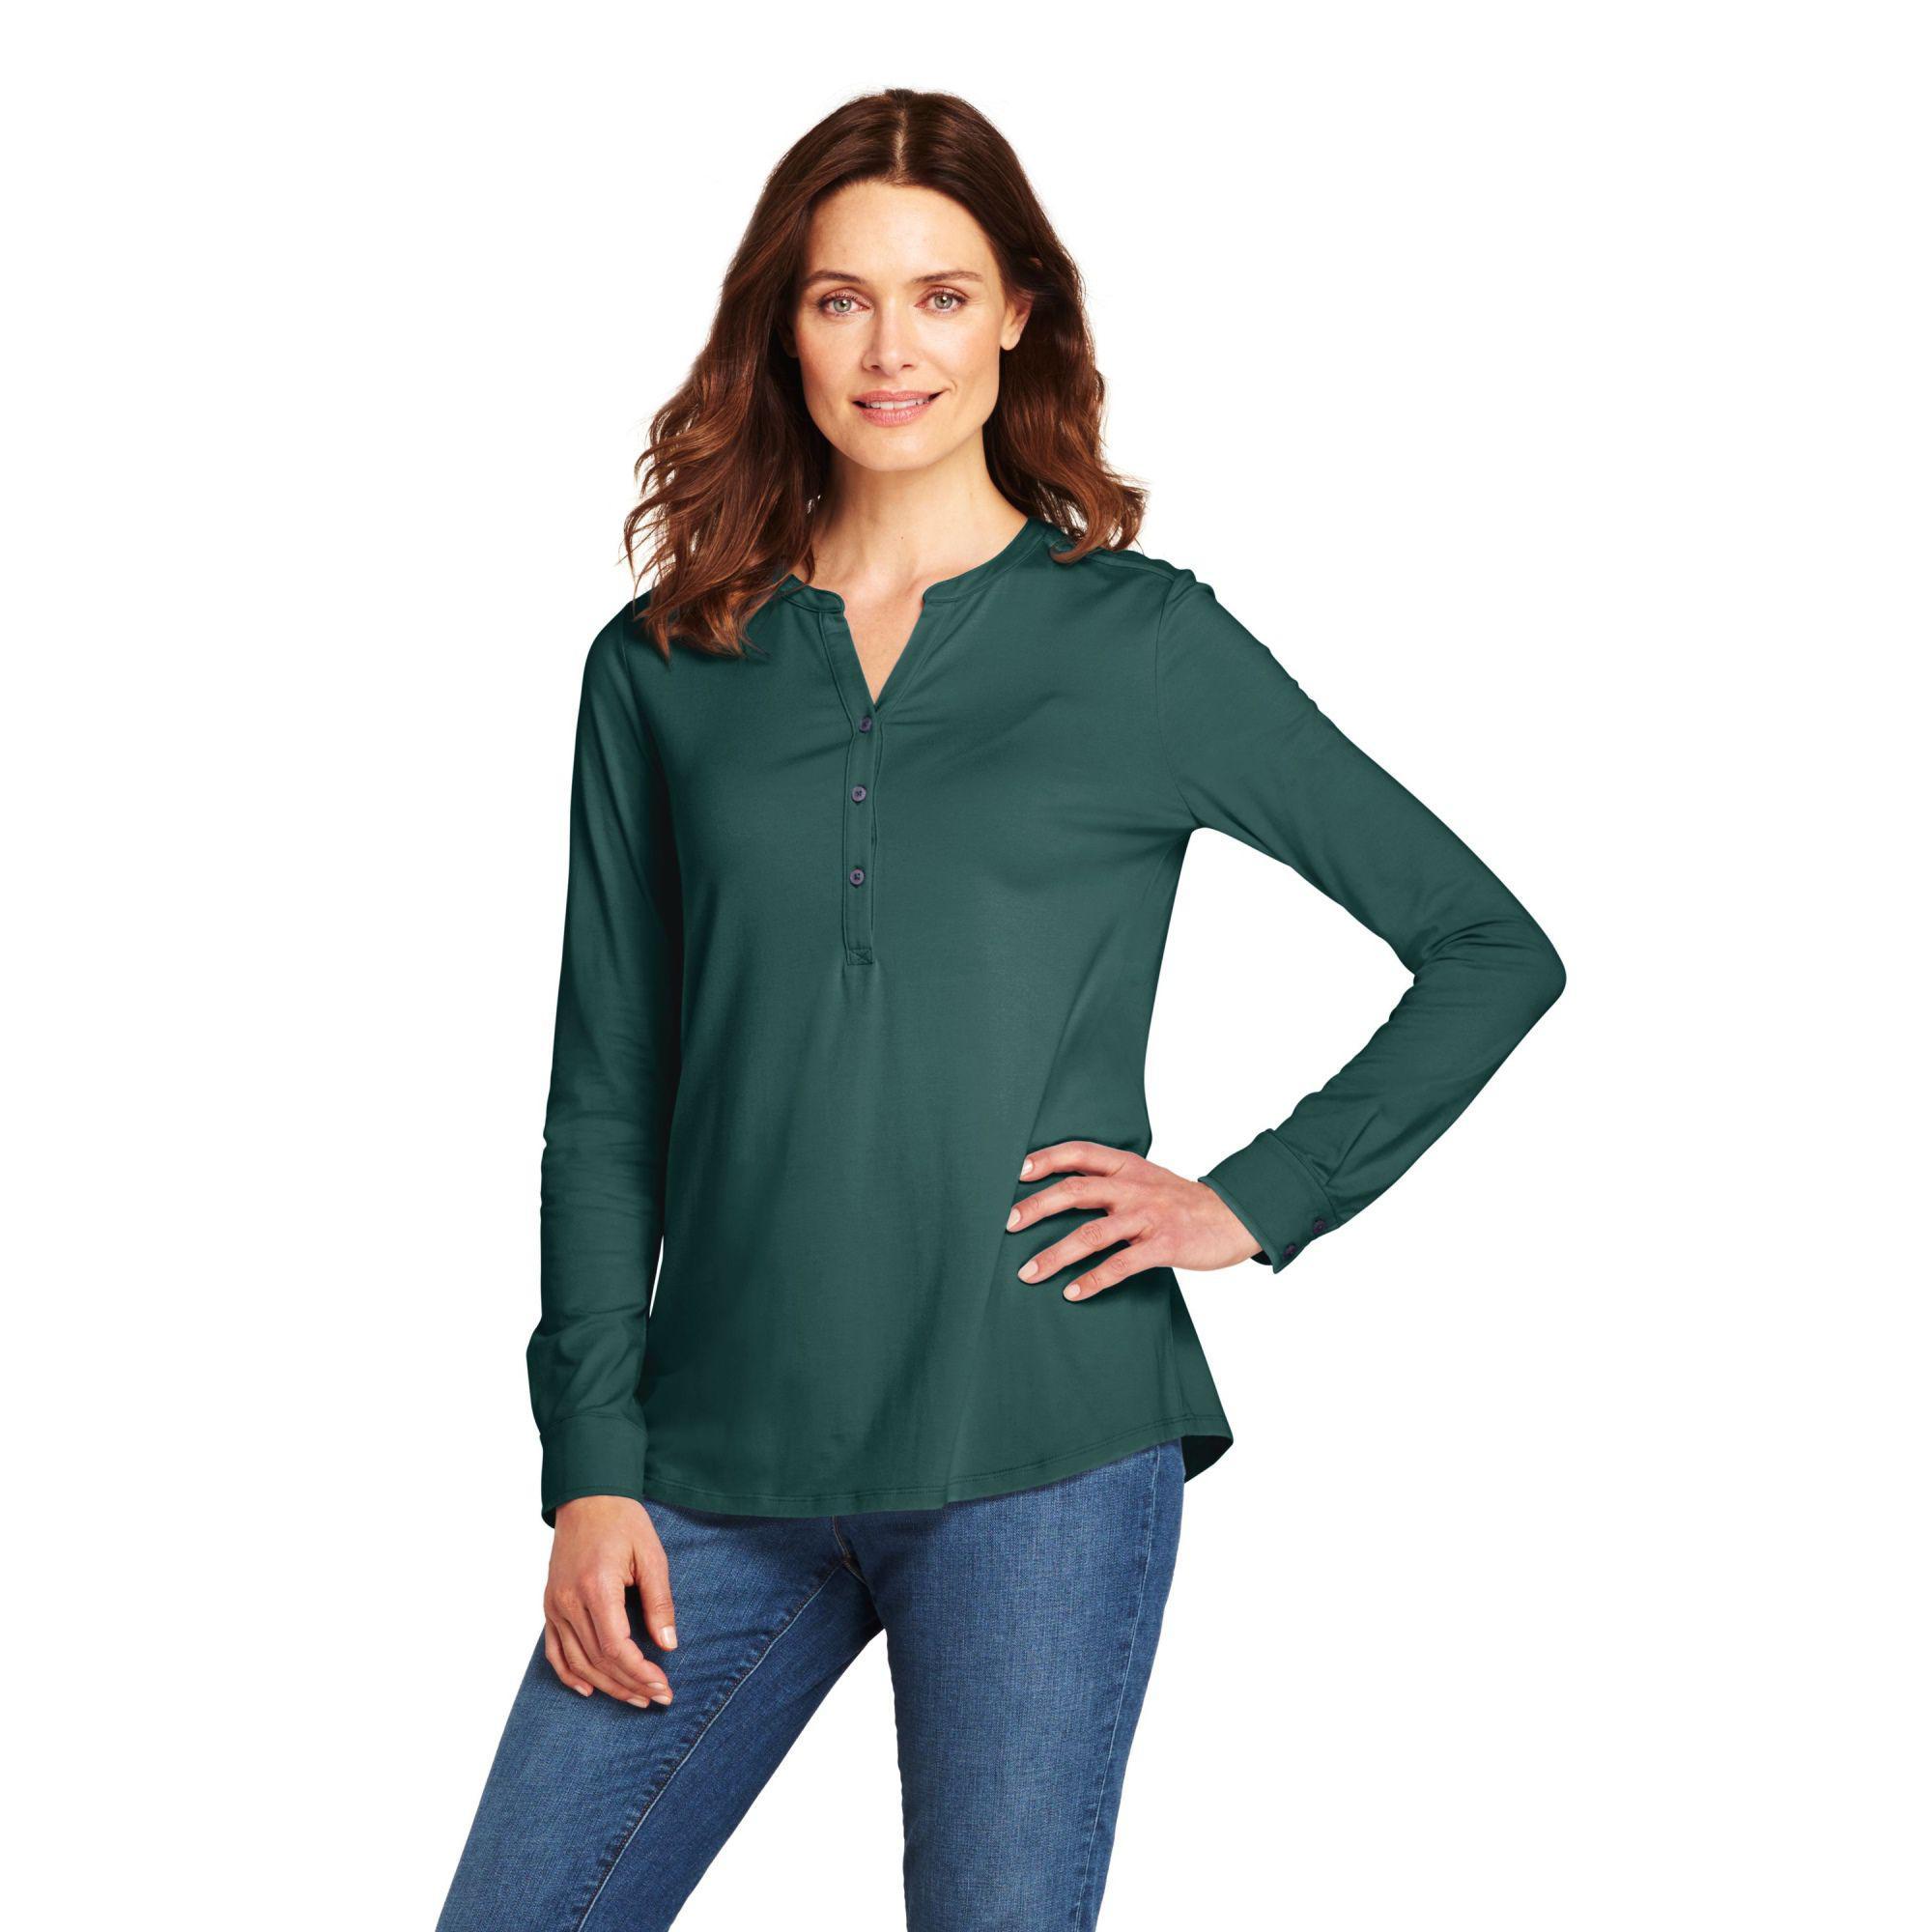 a6de23e6ce3 Lands' End Green Womens Cotton/modal Henley Tunic Top in Green - Lyst